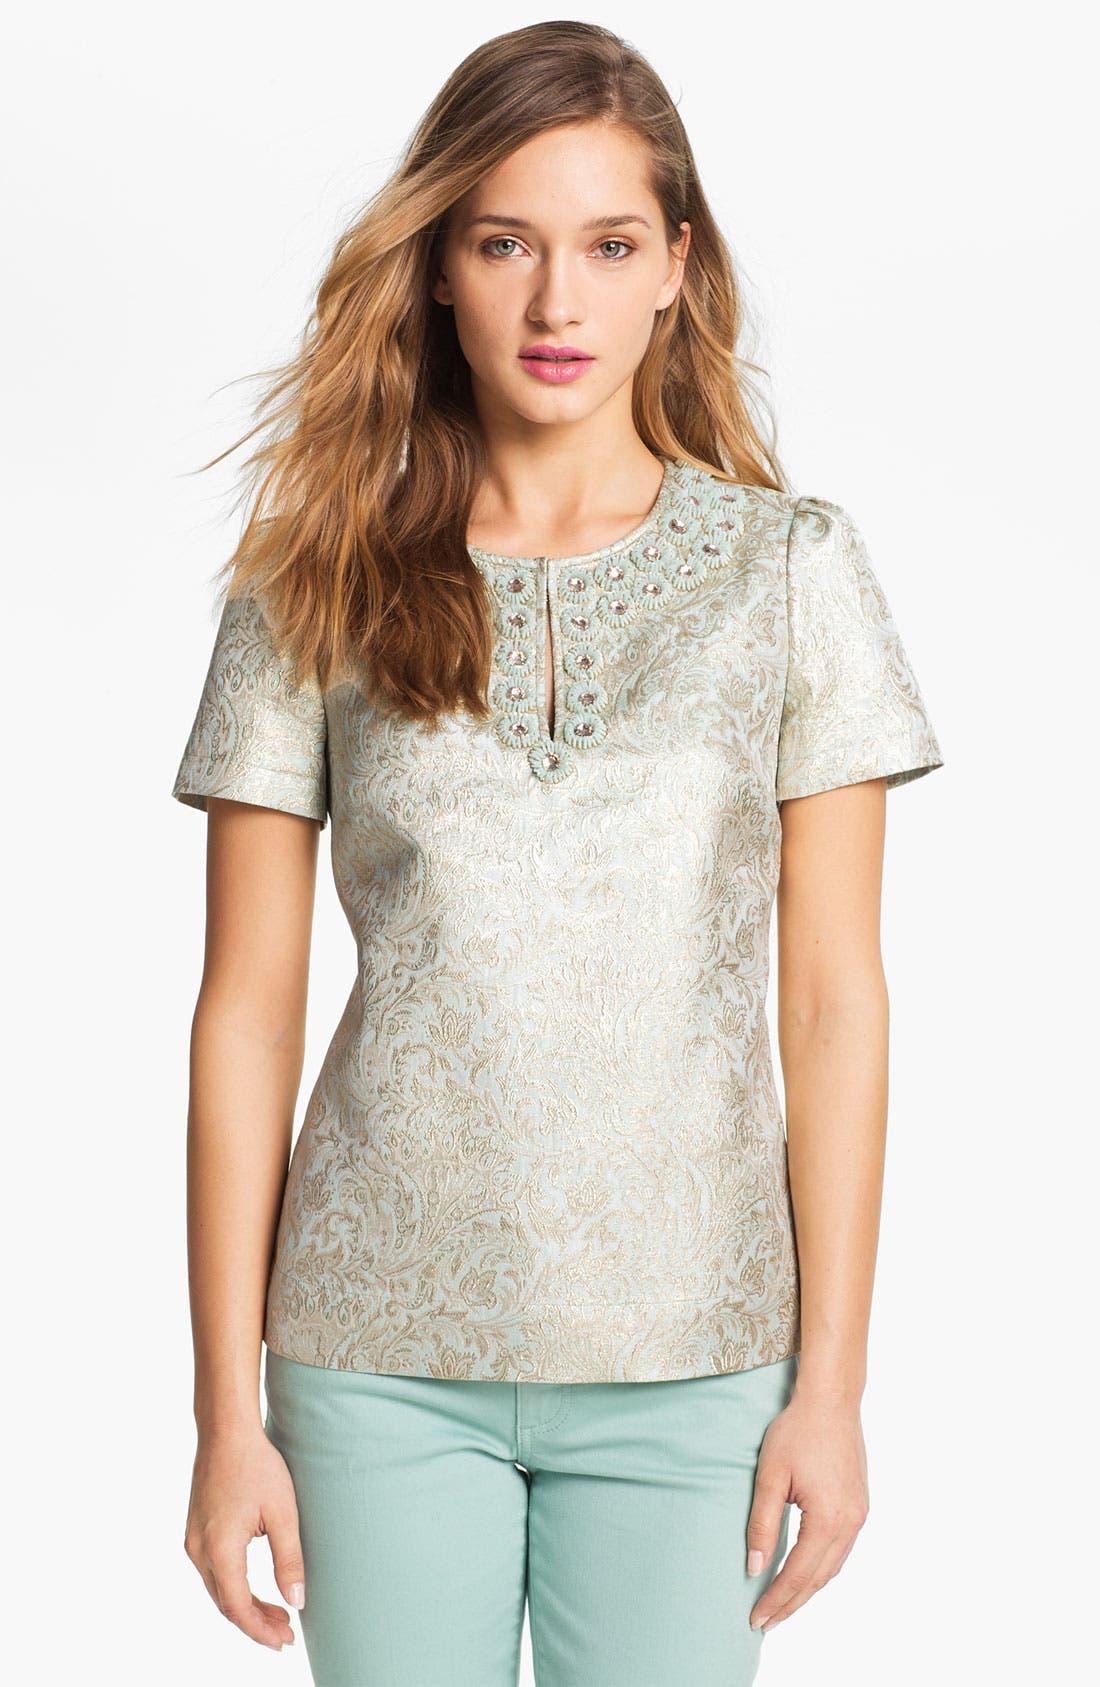 Alternate Image 1 Selected - Tory Burch 'Lola' Metallic Silk Top